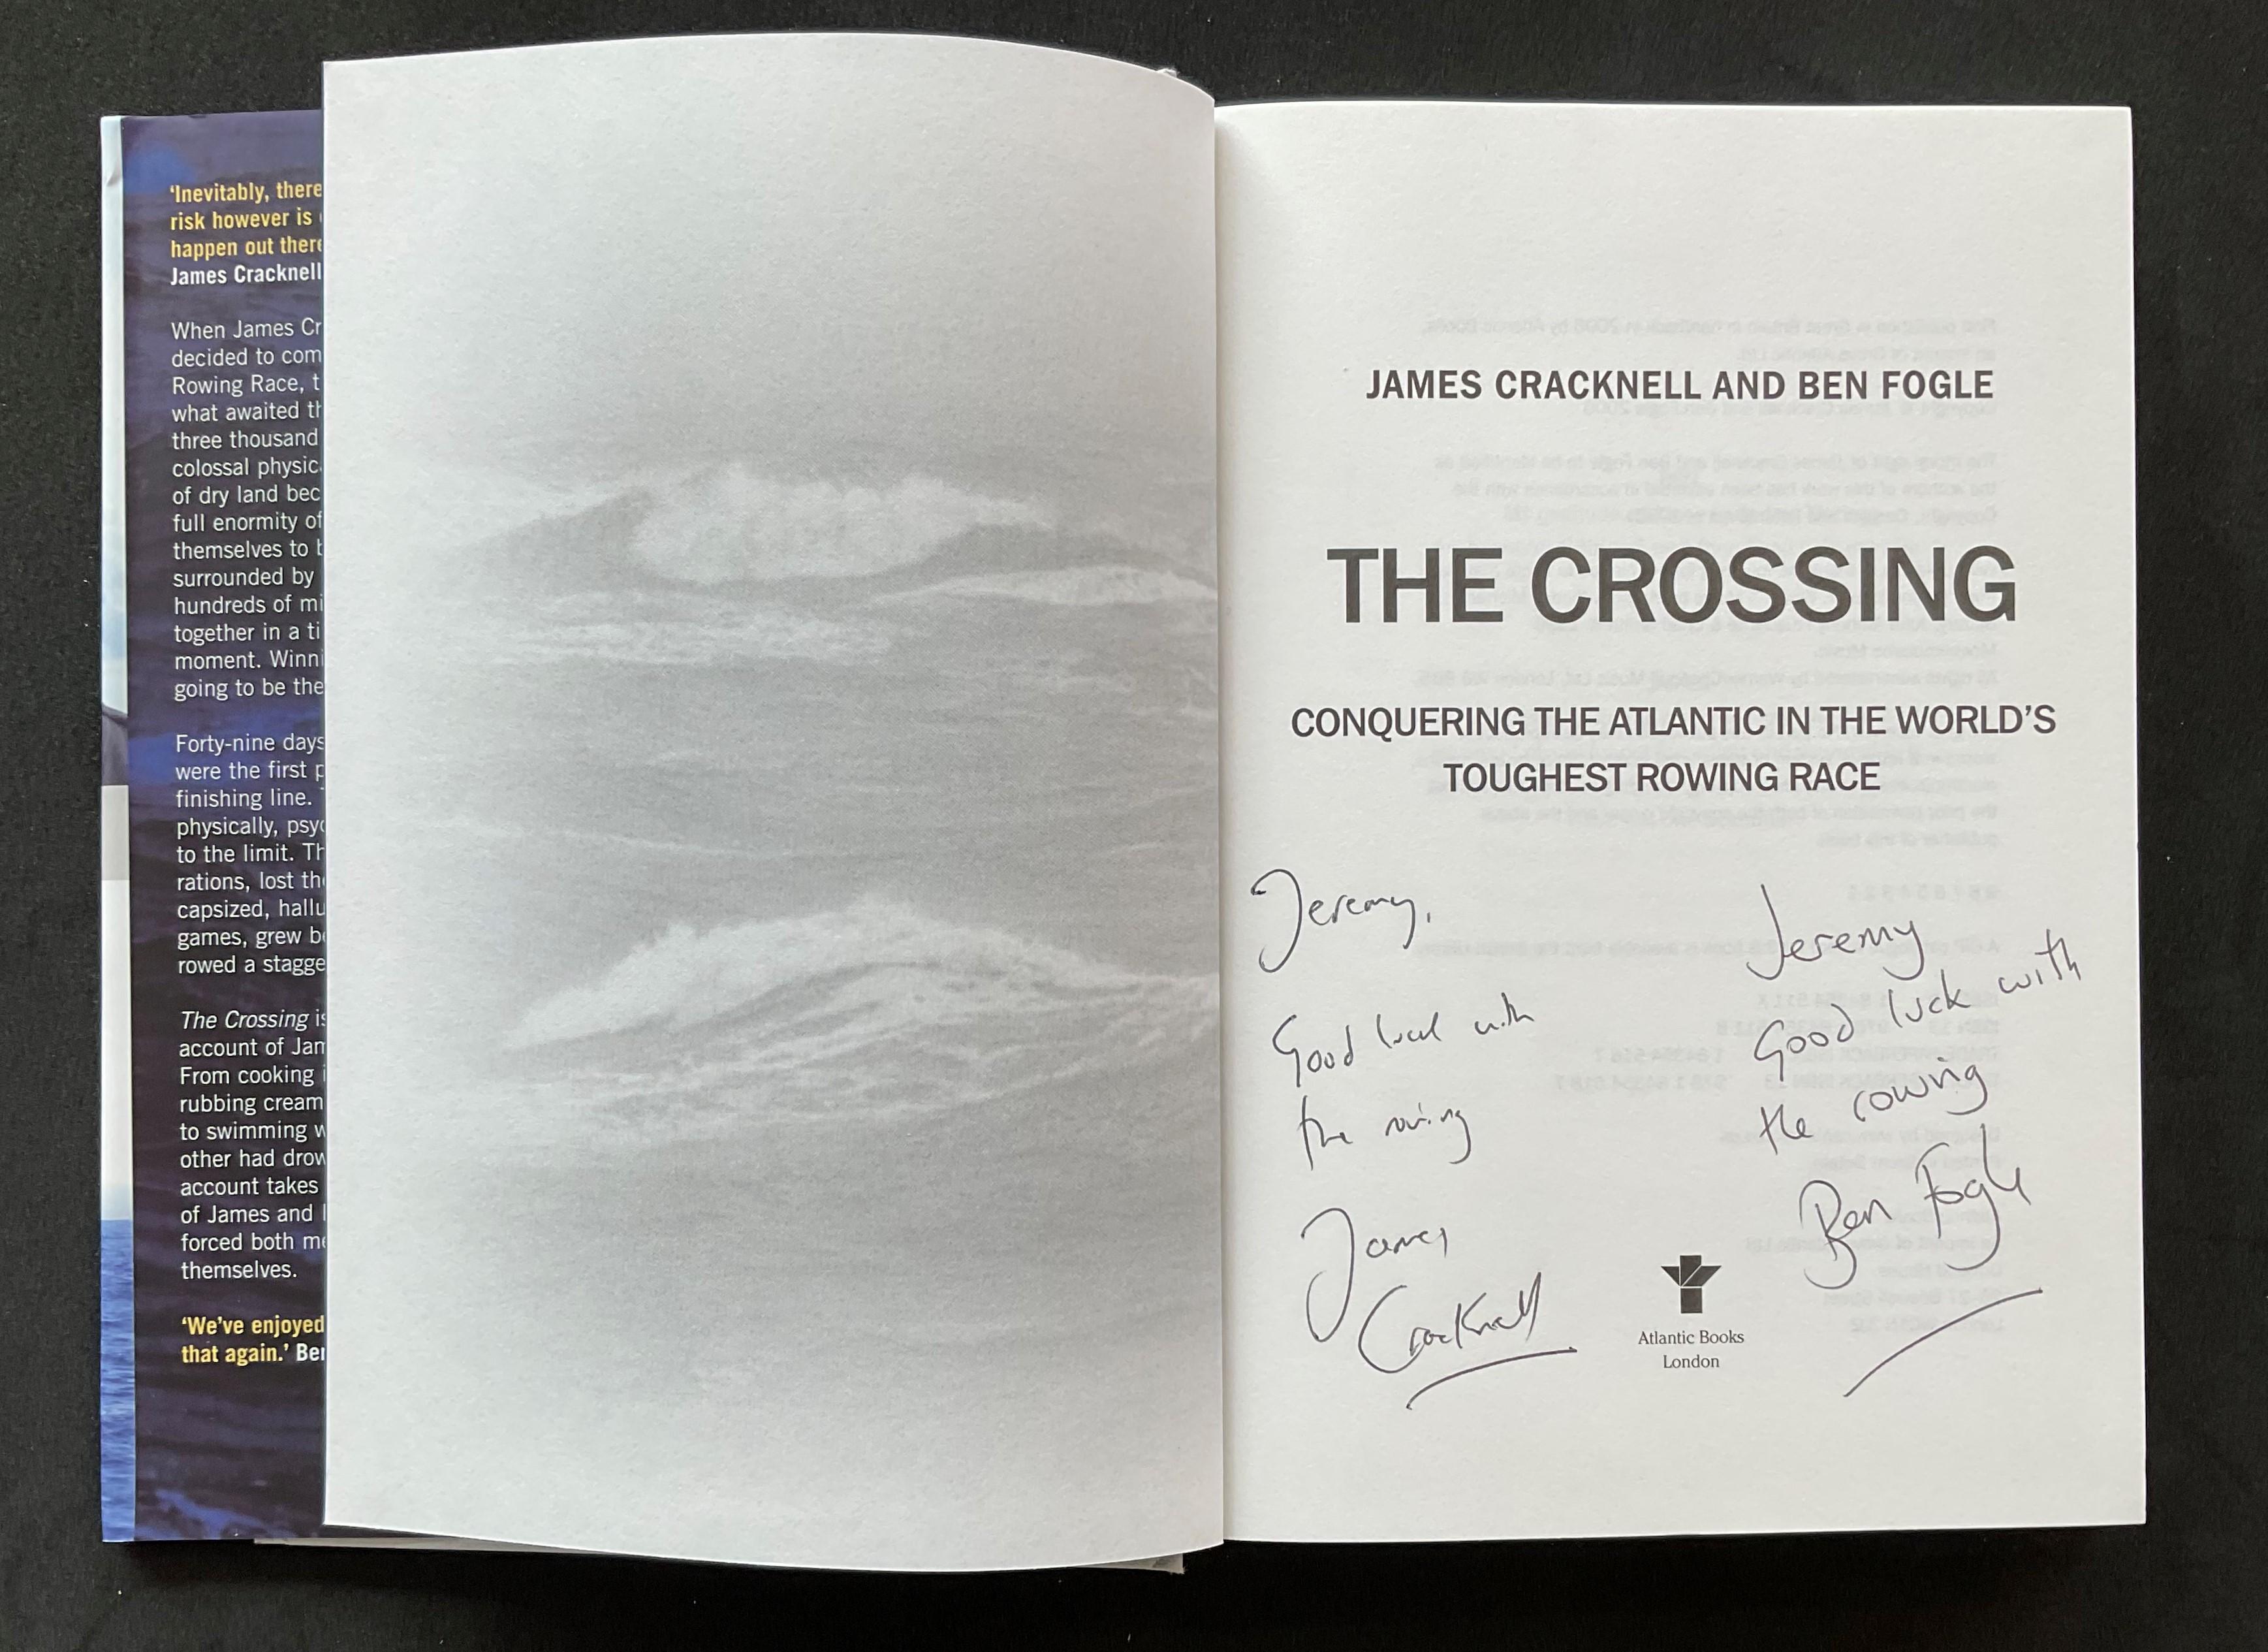 Athlete James Cracknell and Broadcaster Ben Fogles book The Crossing, signed hardback copy, - Image 2 of 3